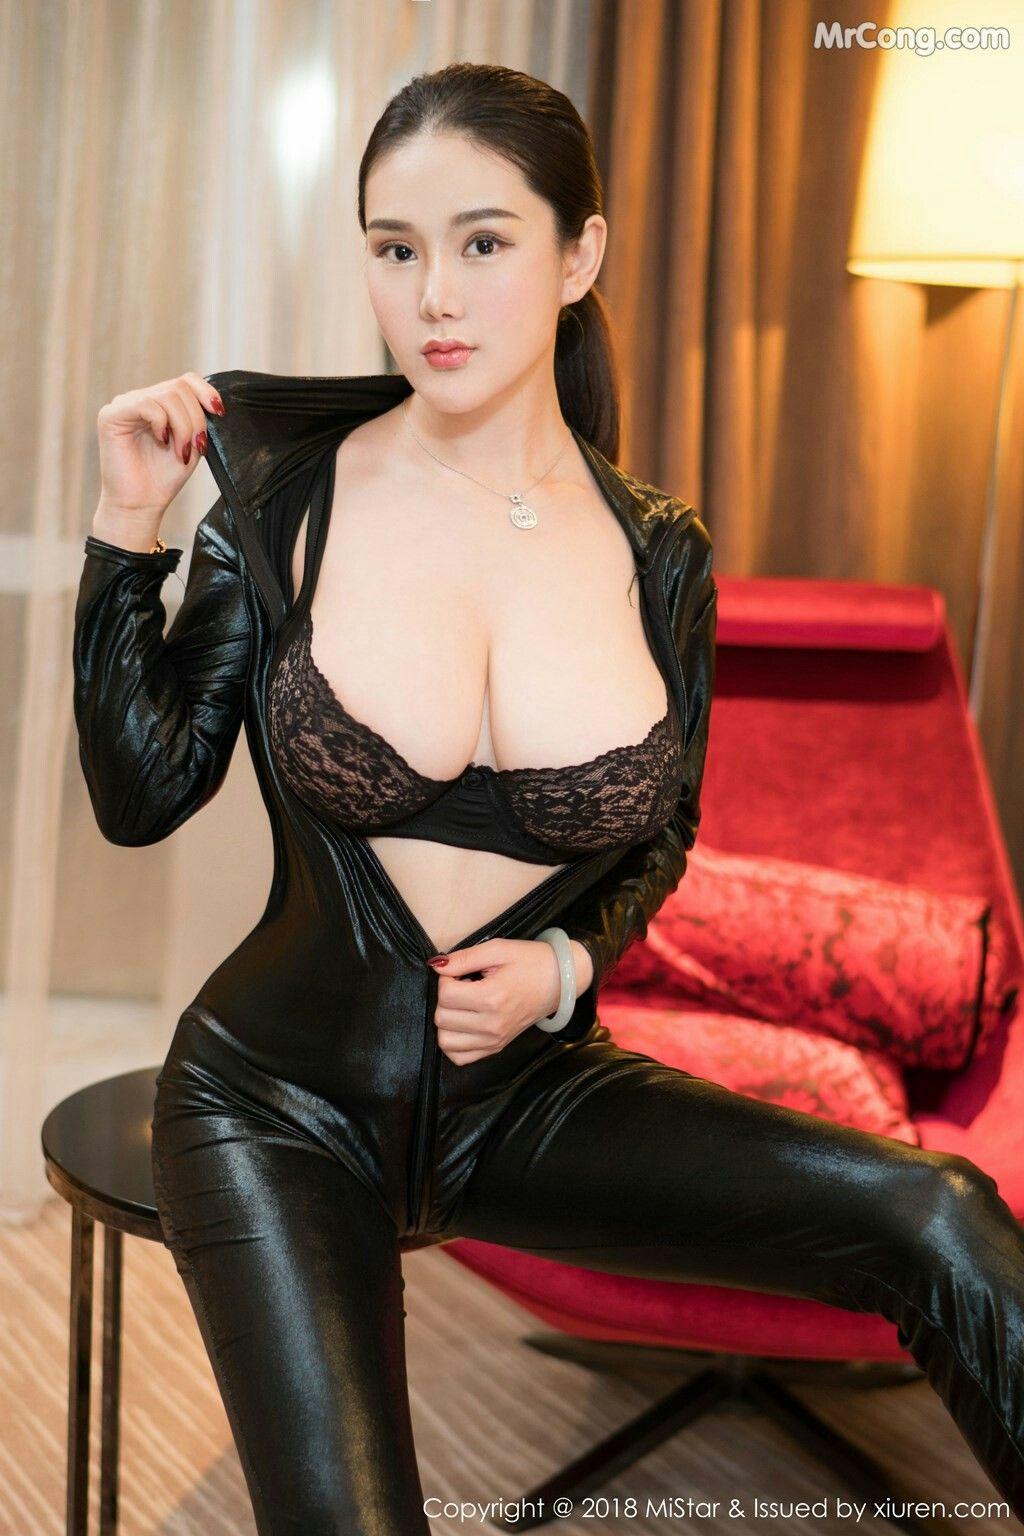 XiuRen Vol. 2275 Na Lu Selena - Page 4 of 5 - Best Hot Girls